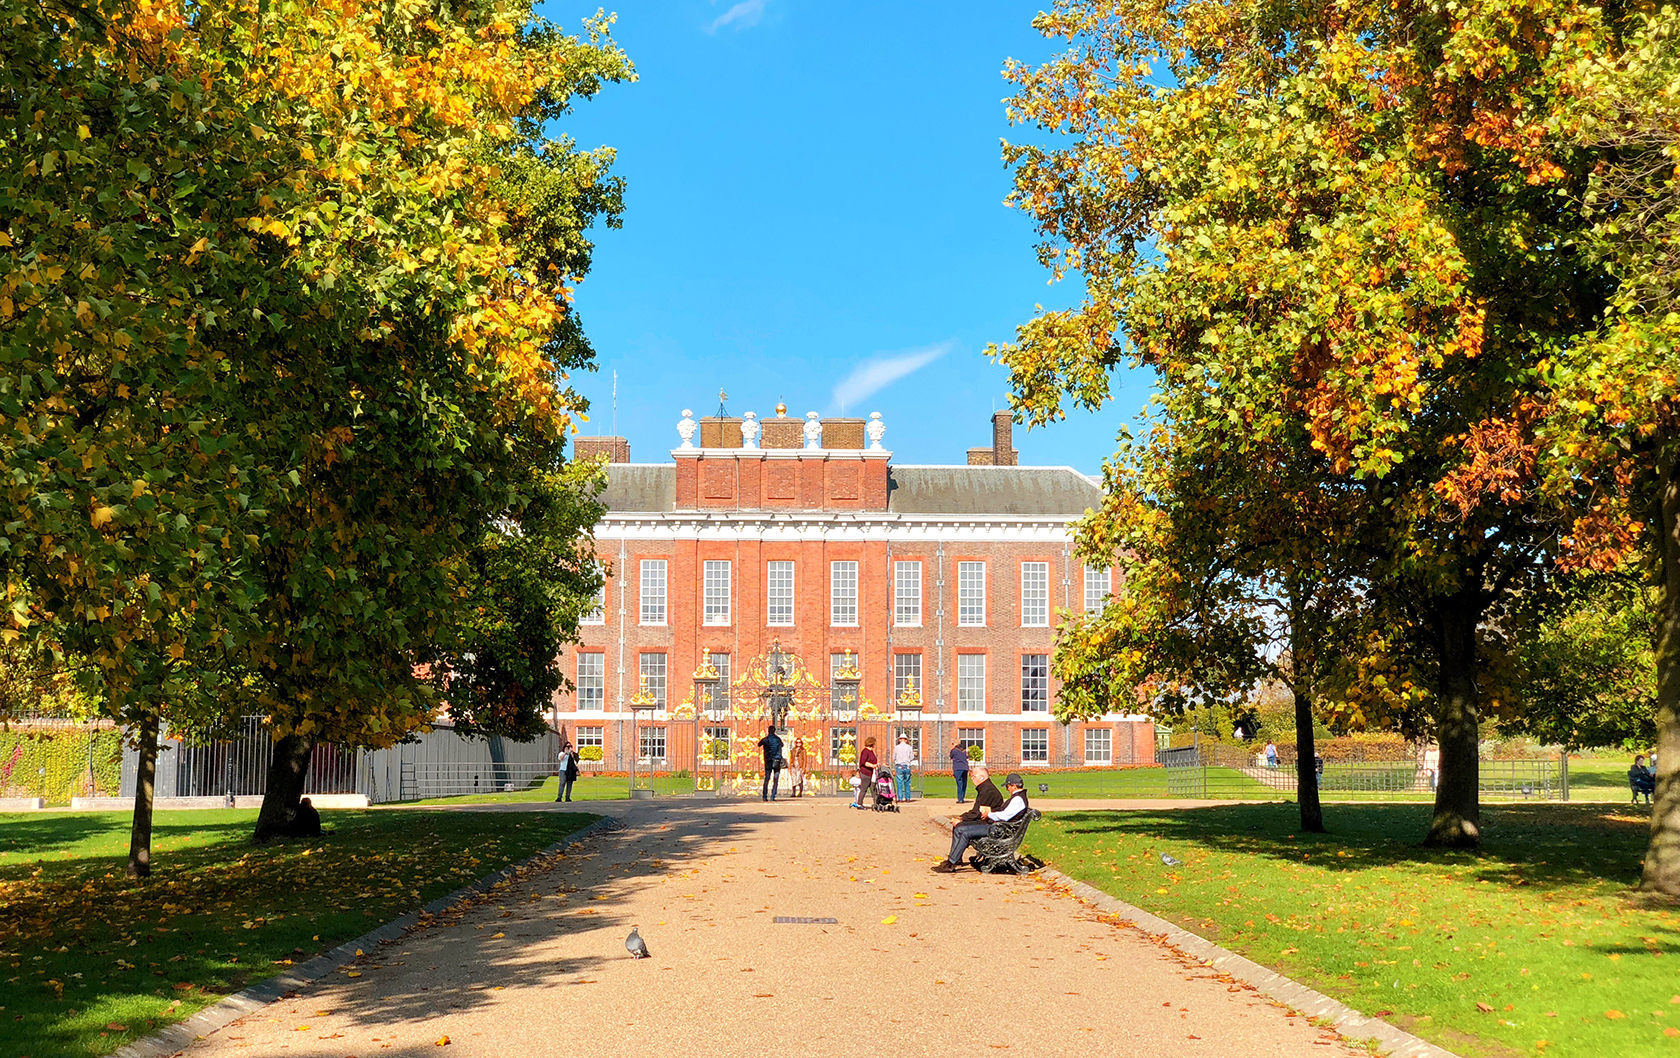 Autumn in Kensington Gardens